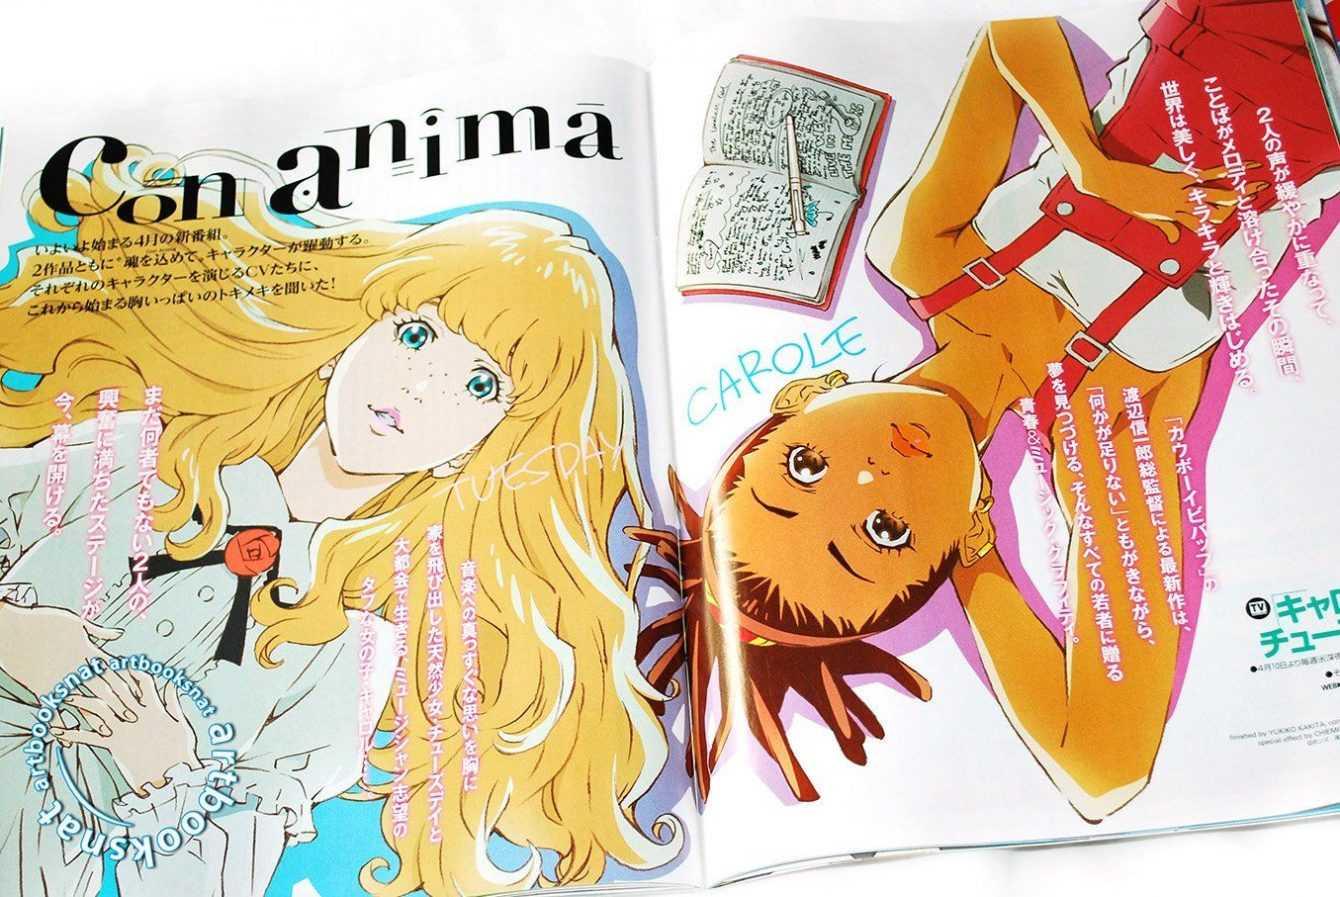 Carole & Tuesday in versione manga debutta in Italia